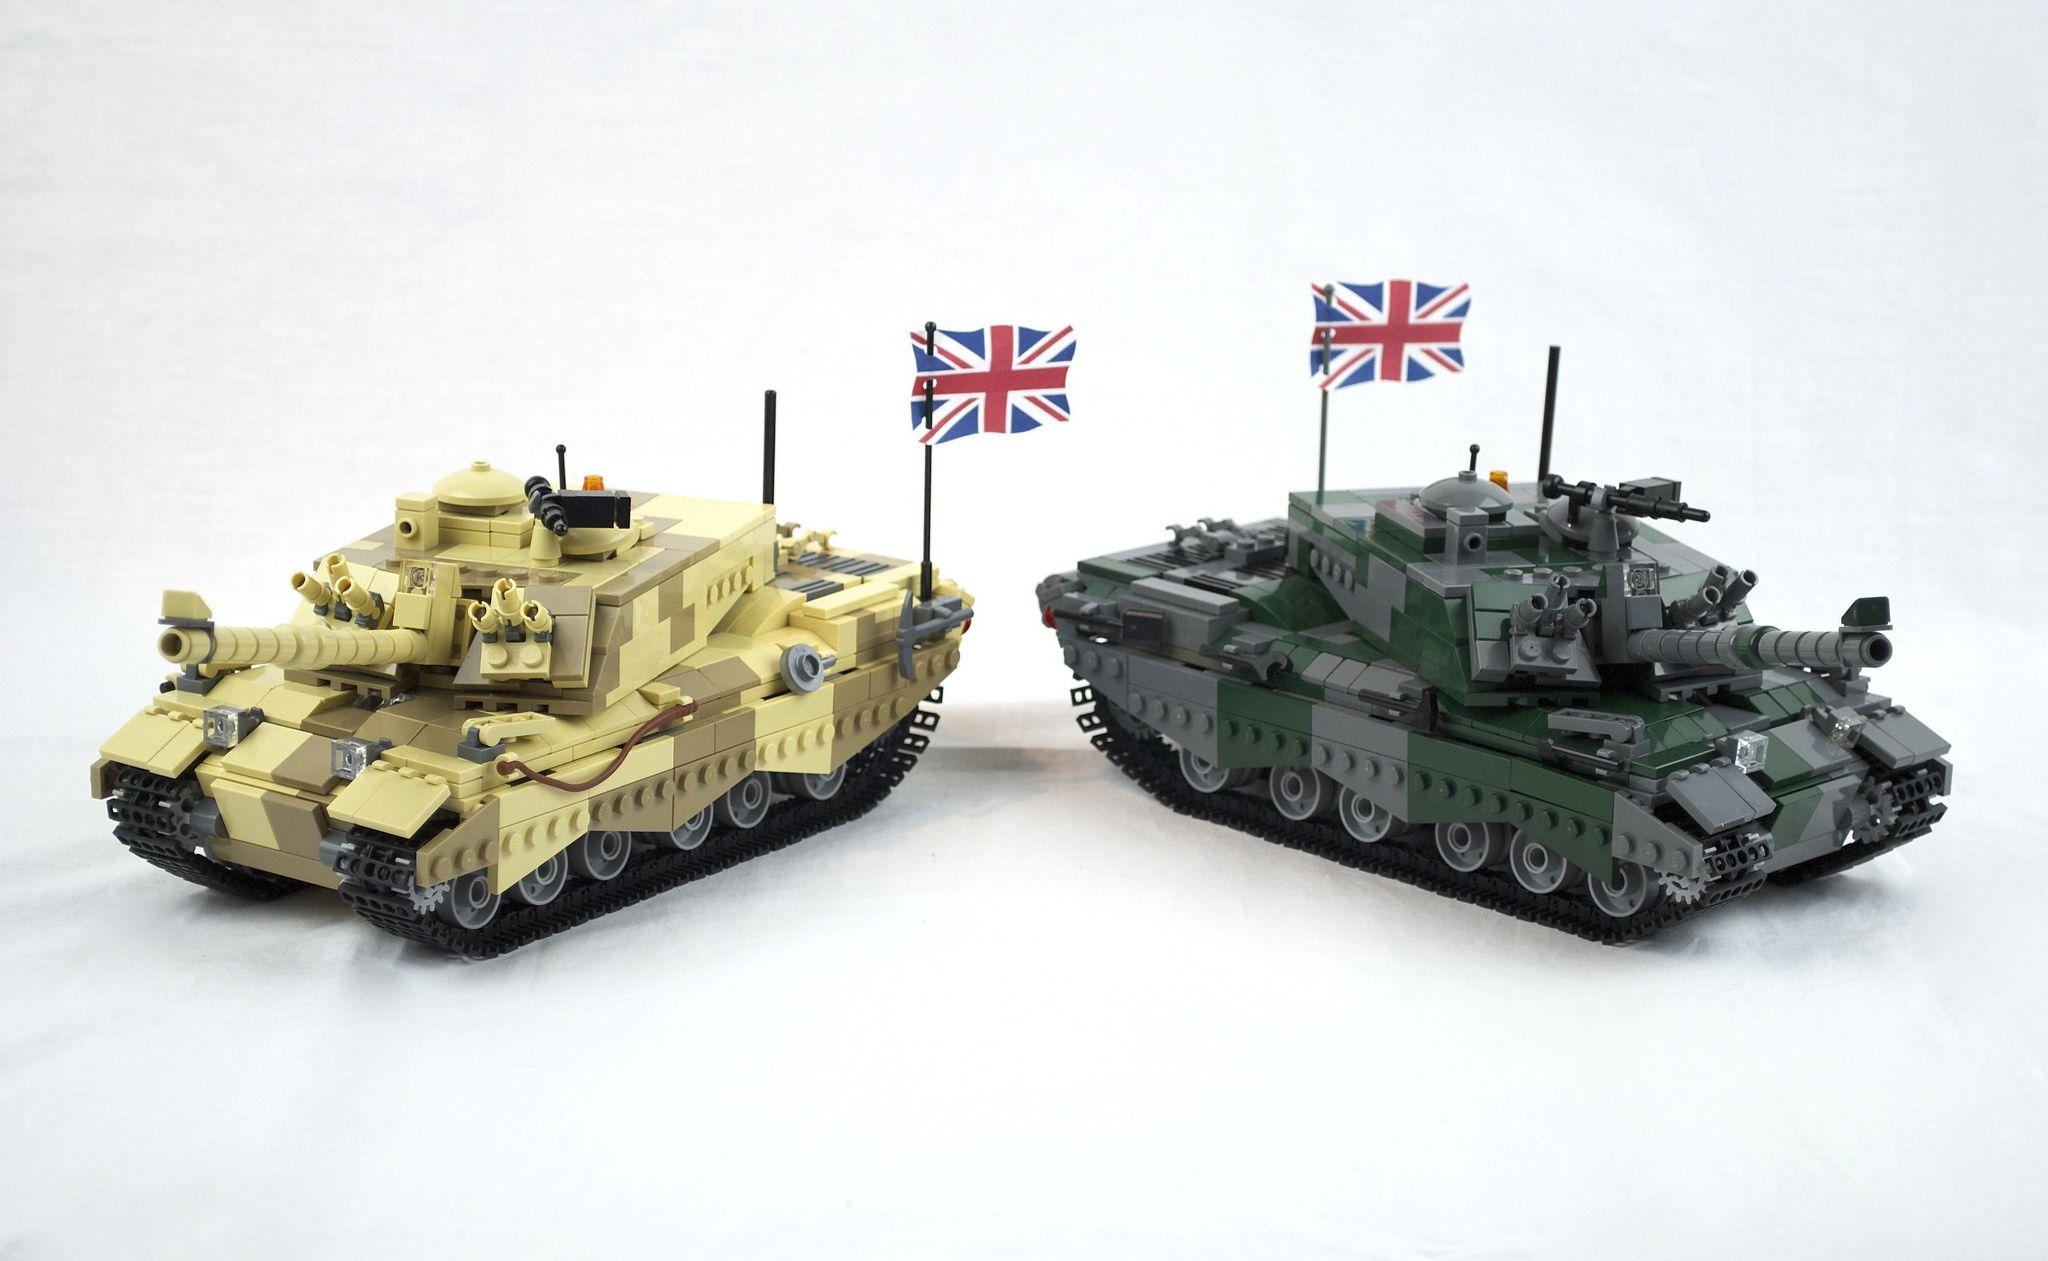 02e7b0cf228f https   flic.kr p iMMko7 Lego Challenger II British MBT